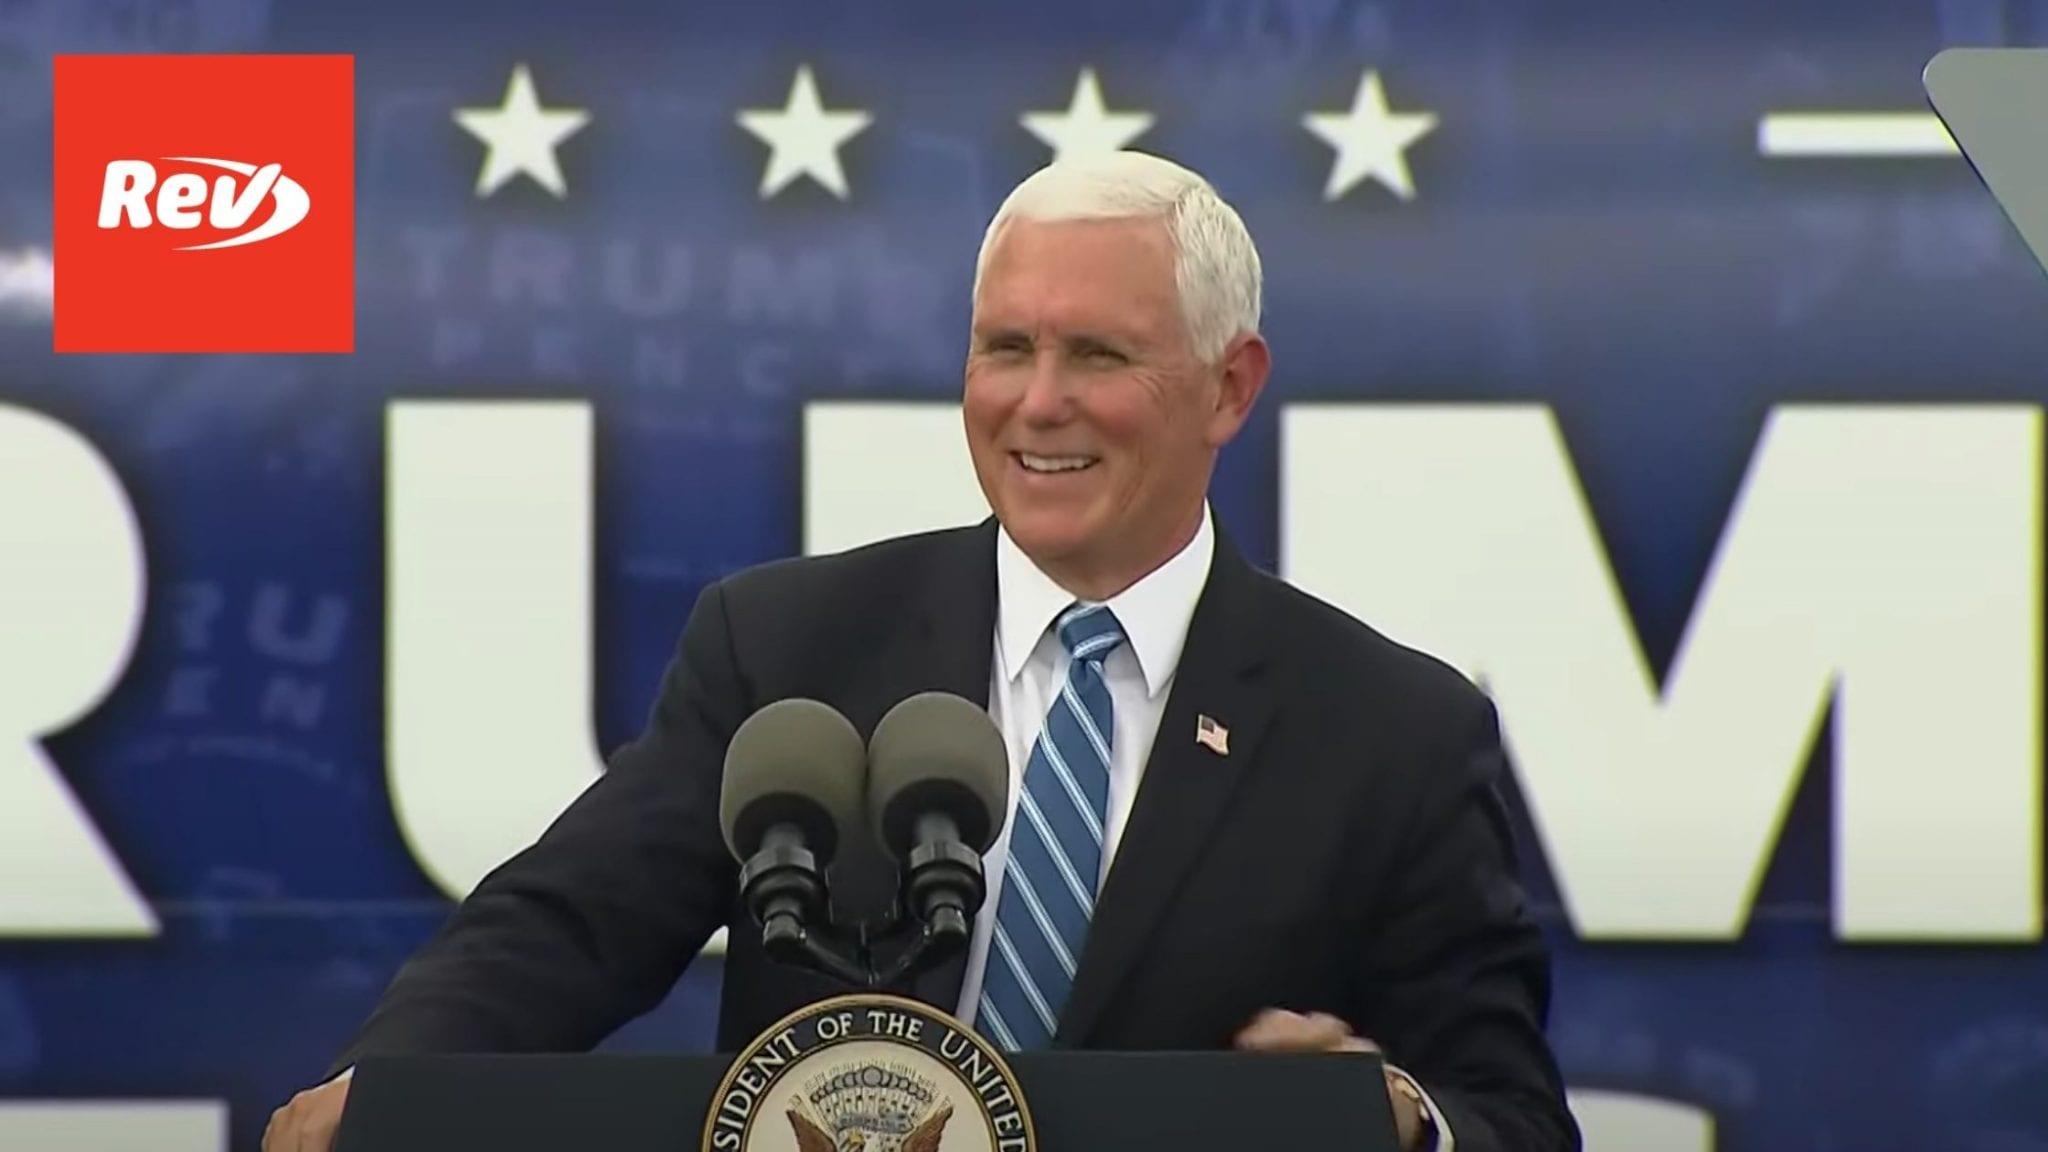 Mike Pence Campaign Speech Miami Transcript October 15